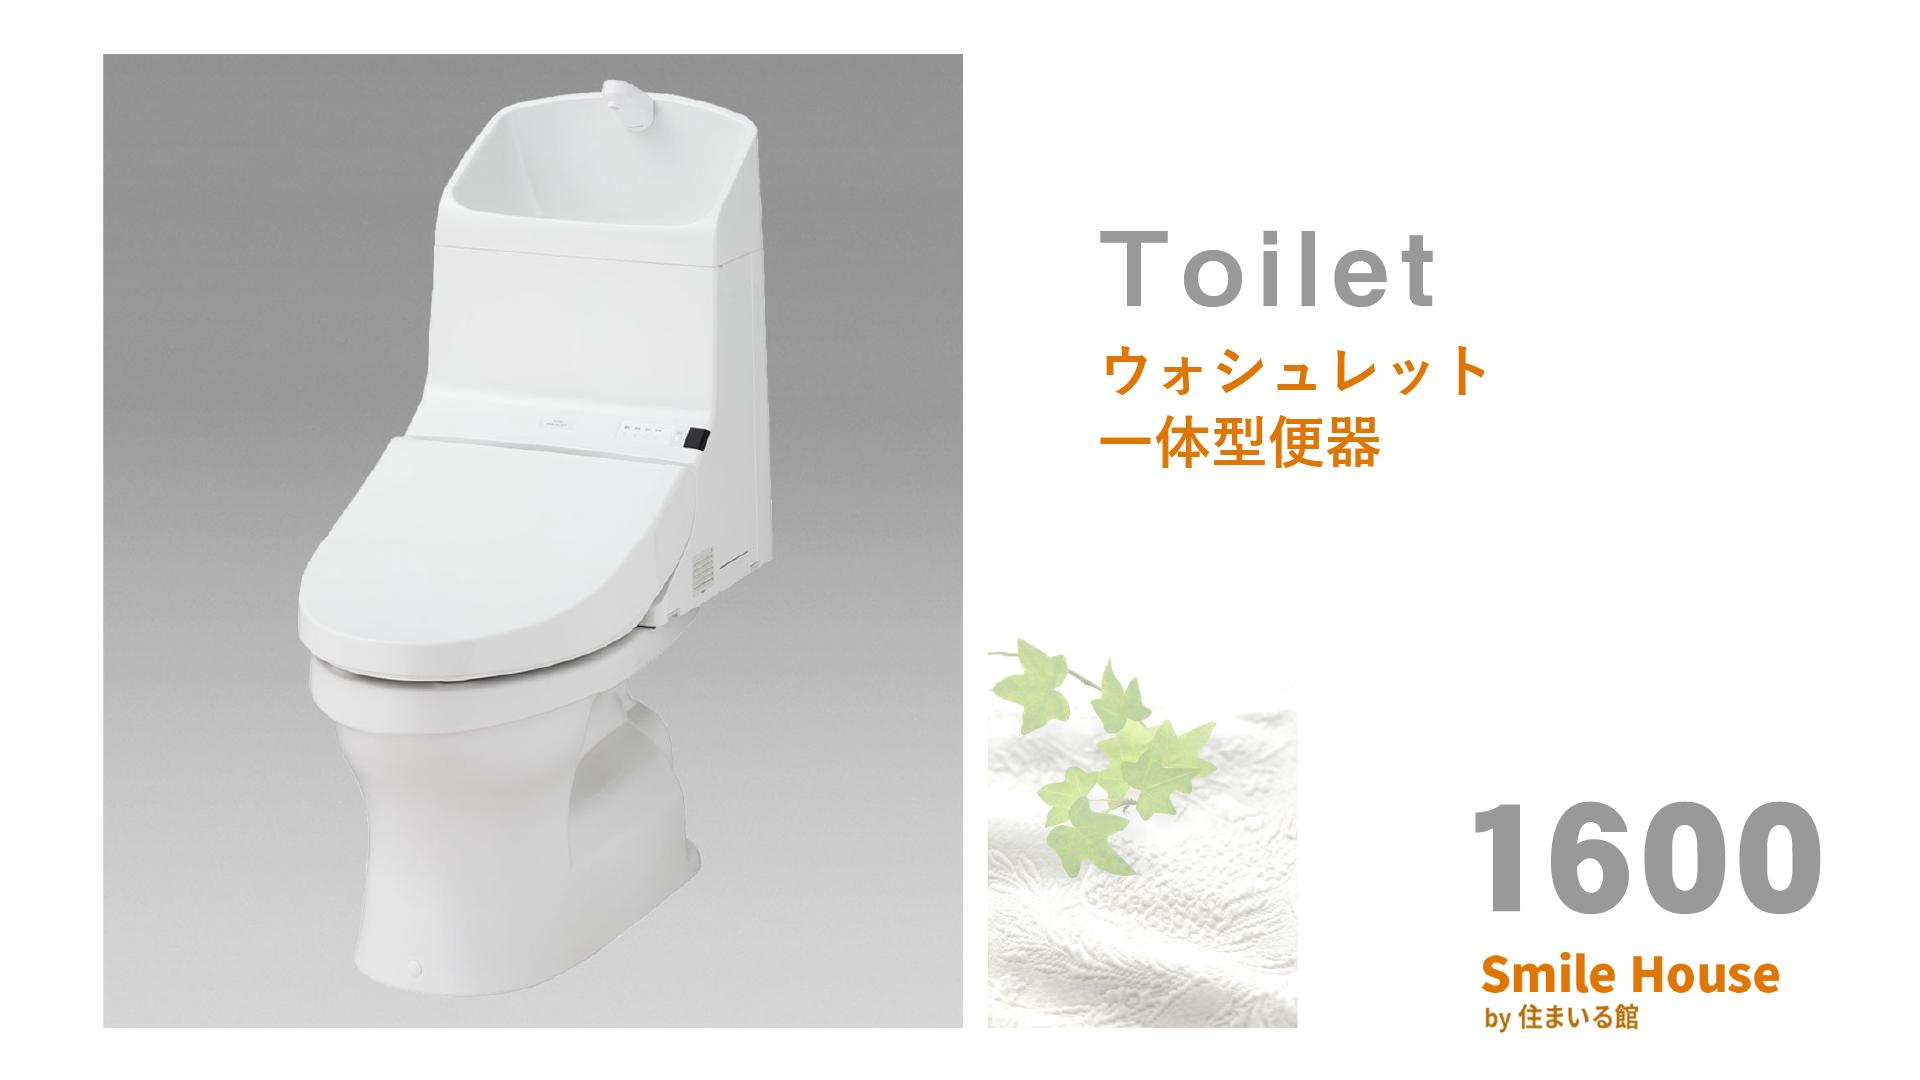 Toilet_2_1600